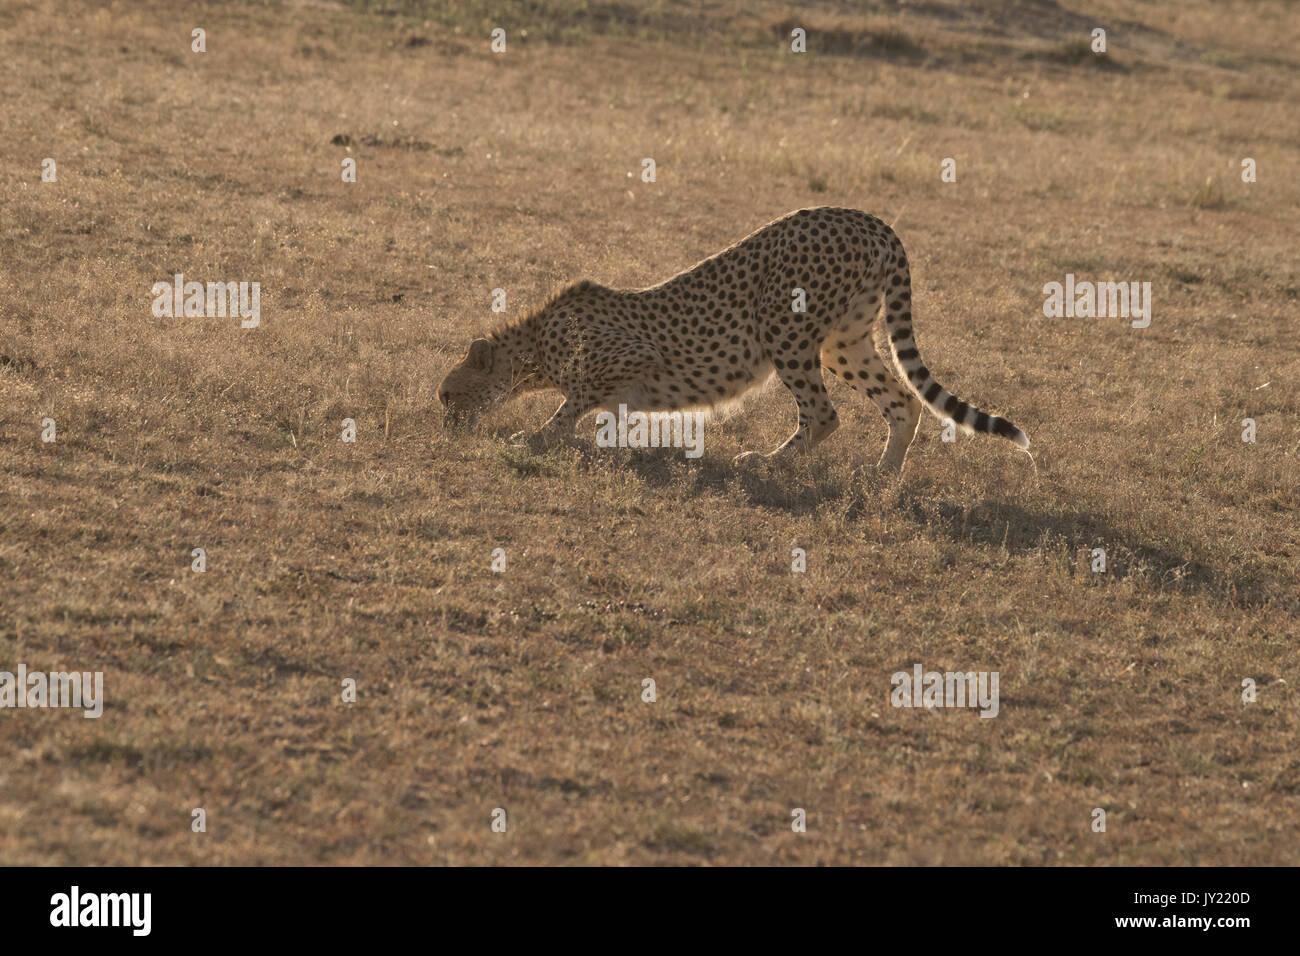 Female cheetah walking in the Masai Mara game reserve in Kenya - Stock Image